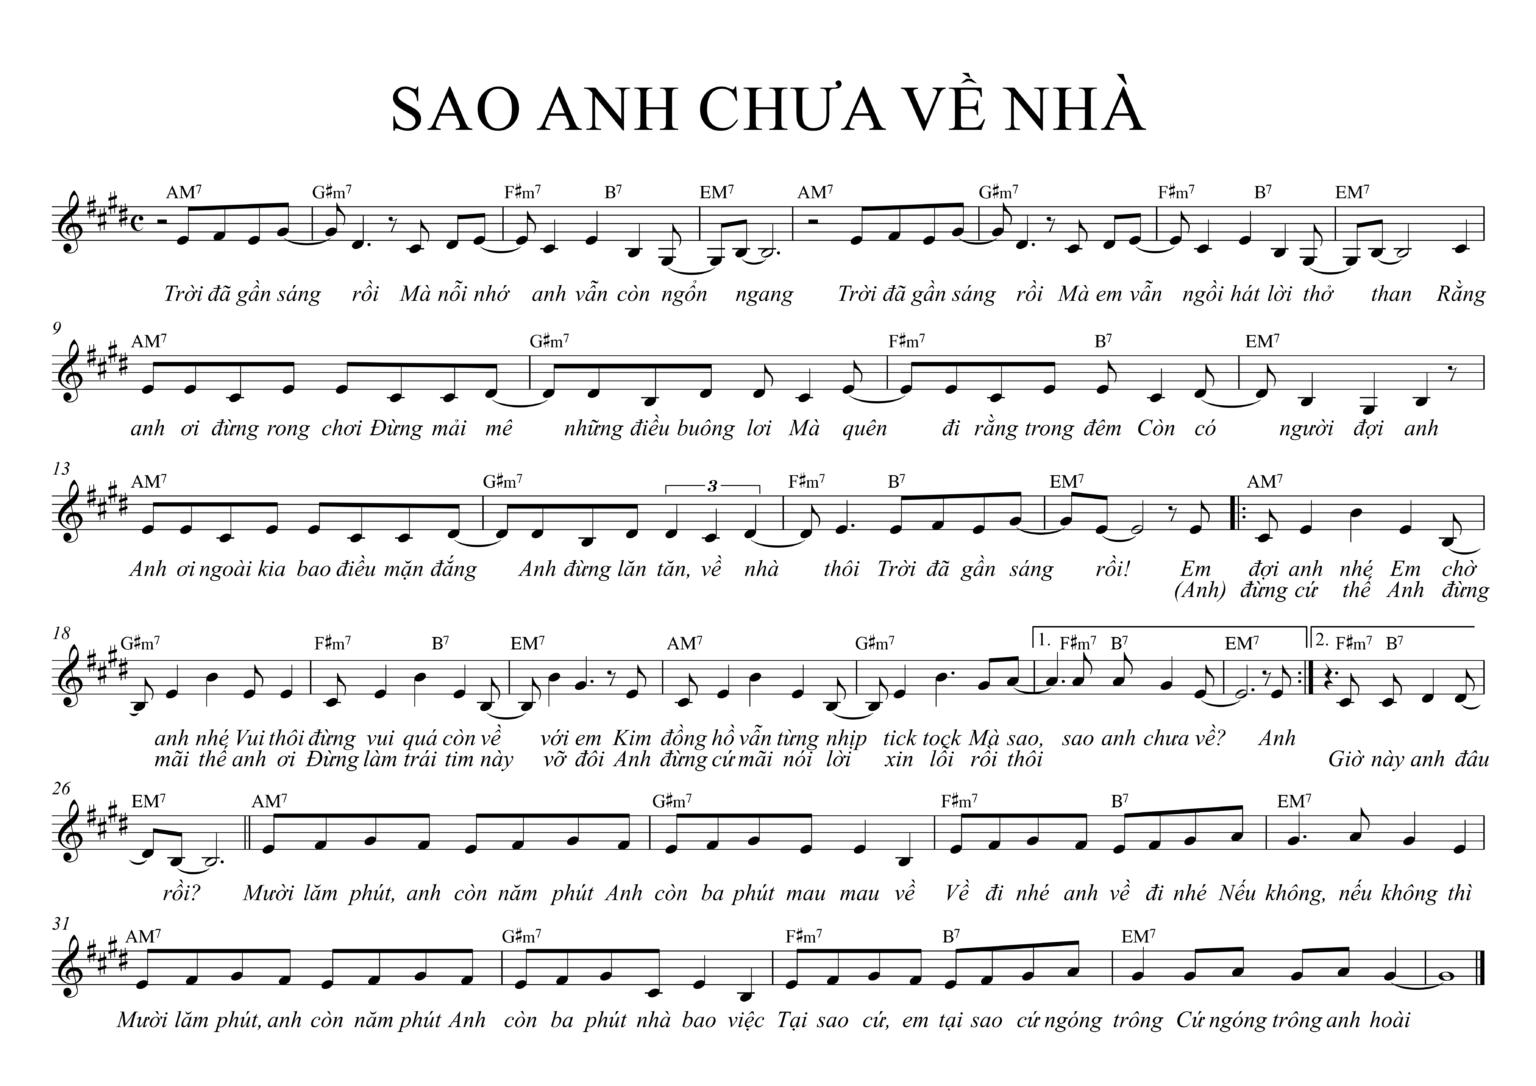 Sheet nhac Sao-anh-chua-ve-nha.png